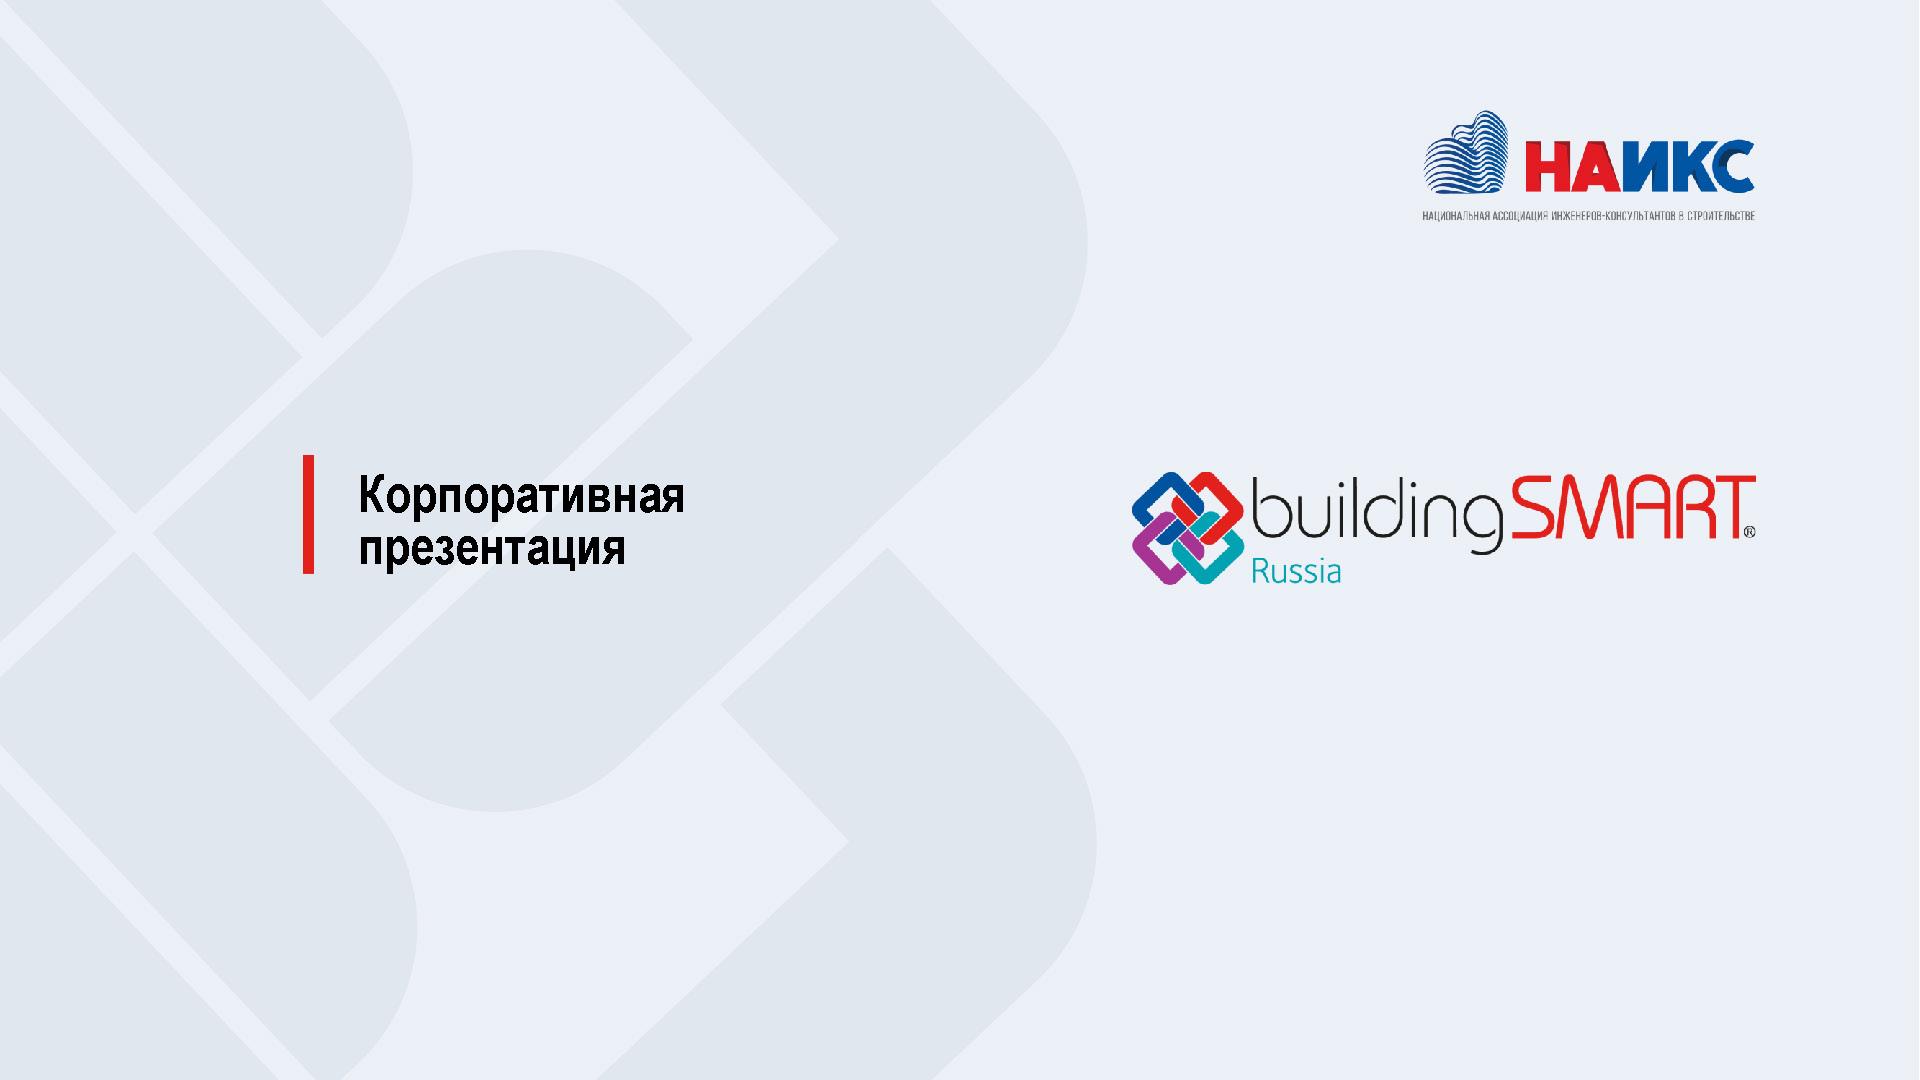 Корпоративная презентация buildingSMART_Страница_01